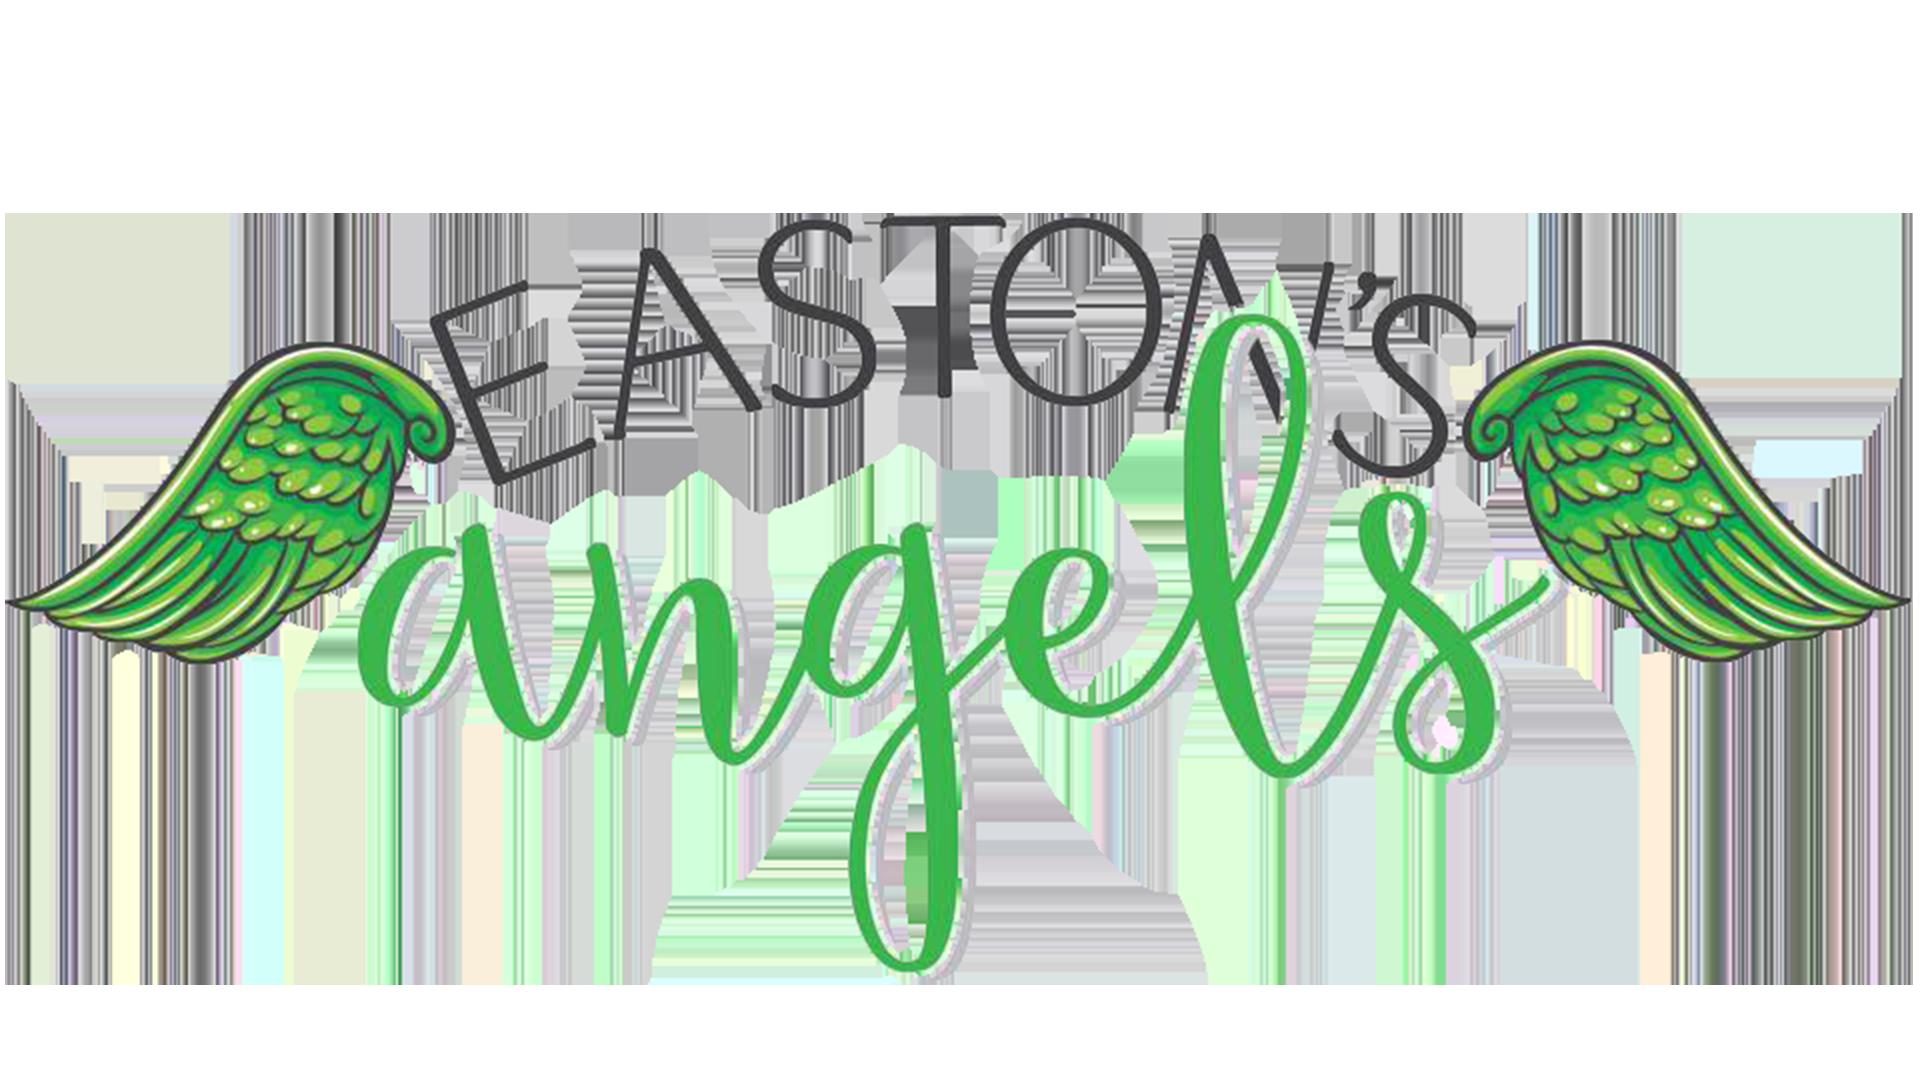 Easton's Angels